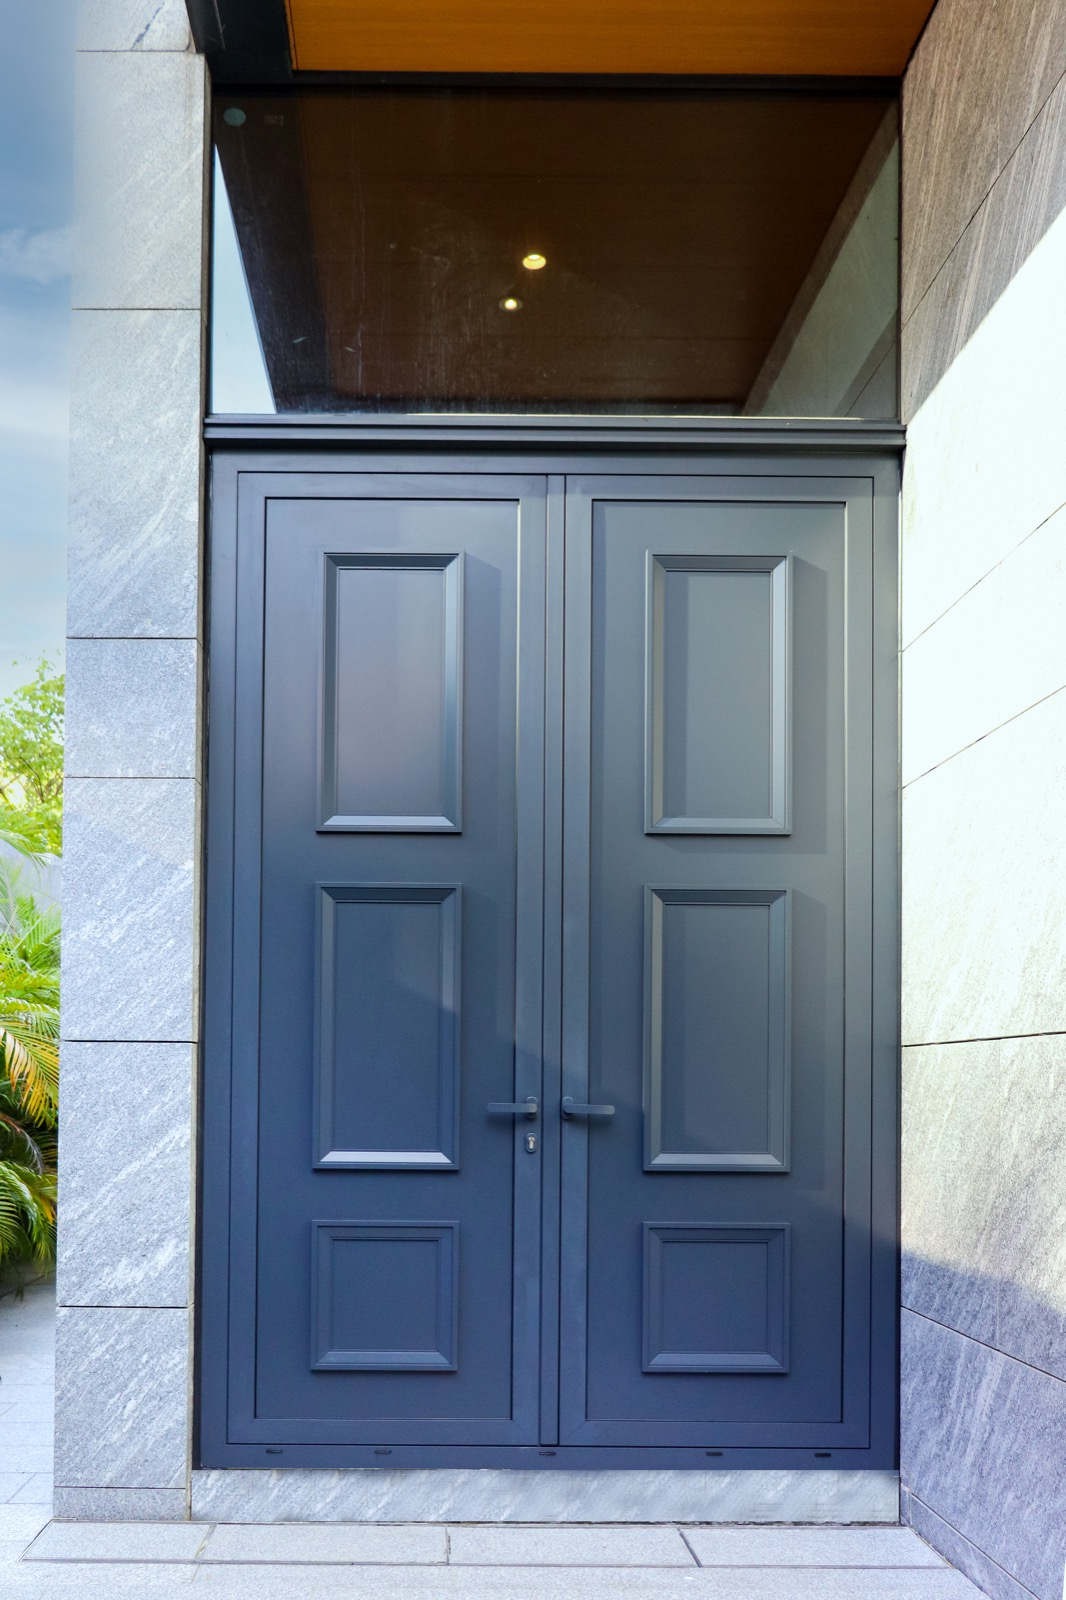 怡星鋁窗-Aliplast-歐洲高級鋁窗玻璃趟門款式-鋁門設計-European-Premium-Window-Window-and-aluminum-door-solution (1)